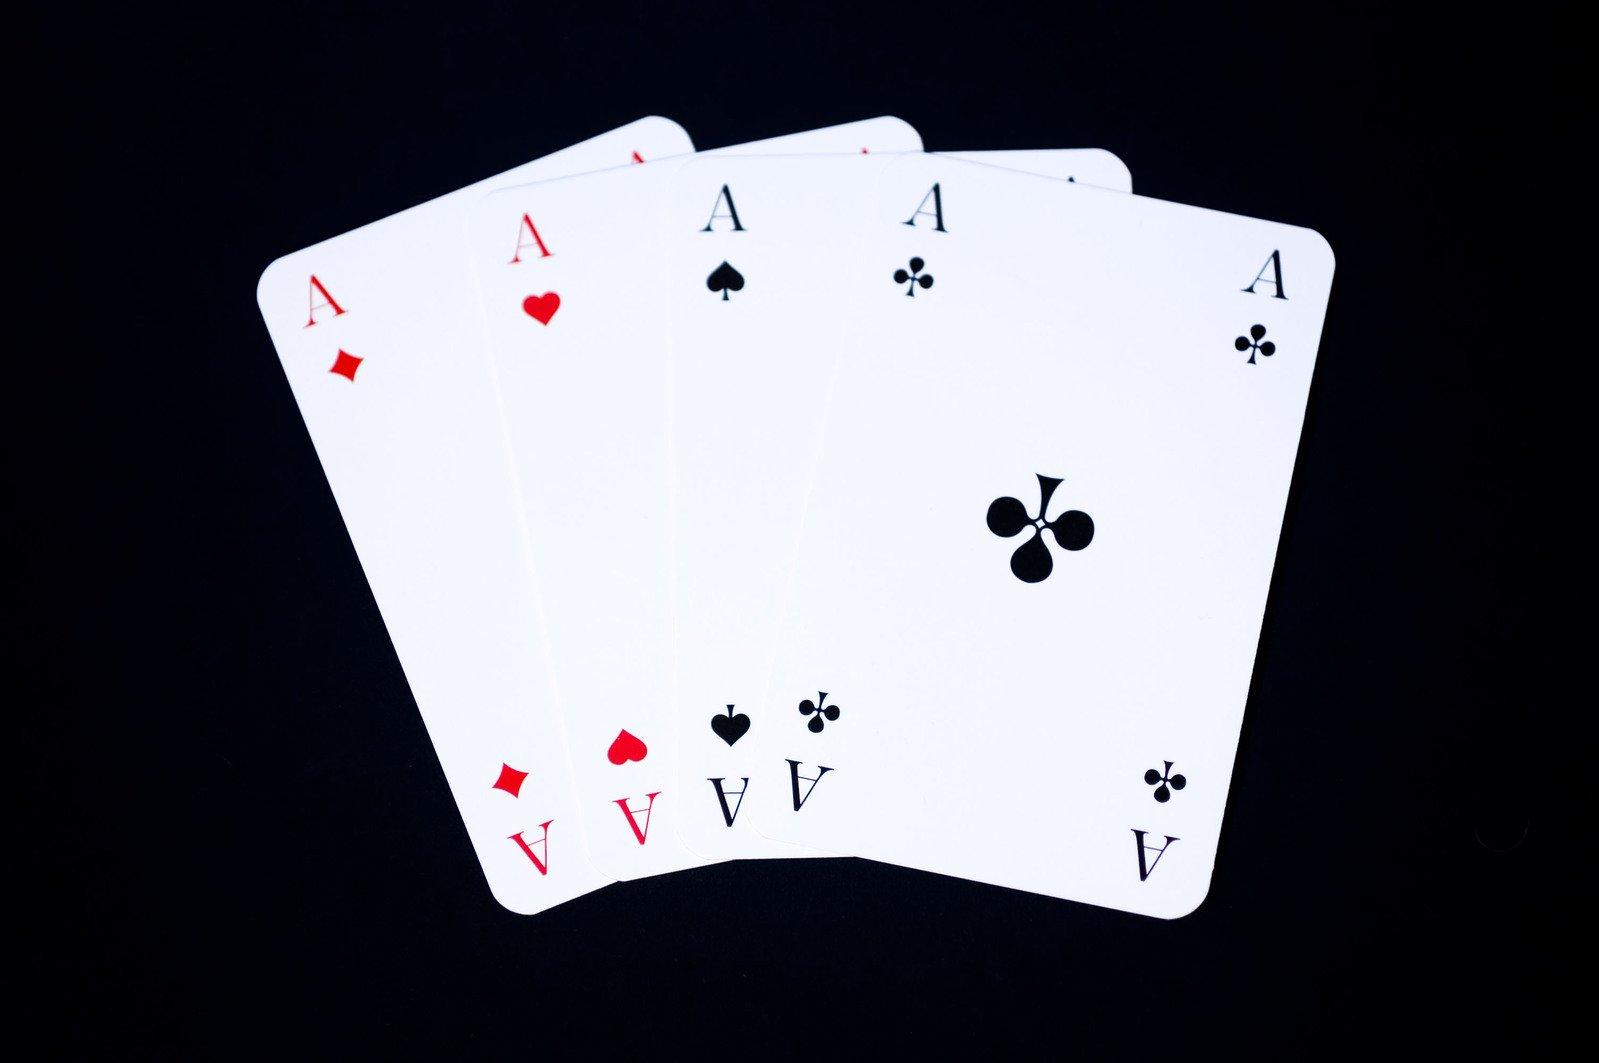 4 immagini 1 parola dadi roulette carte